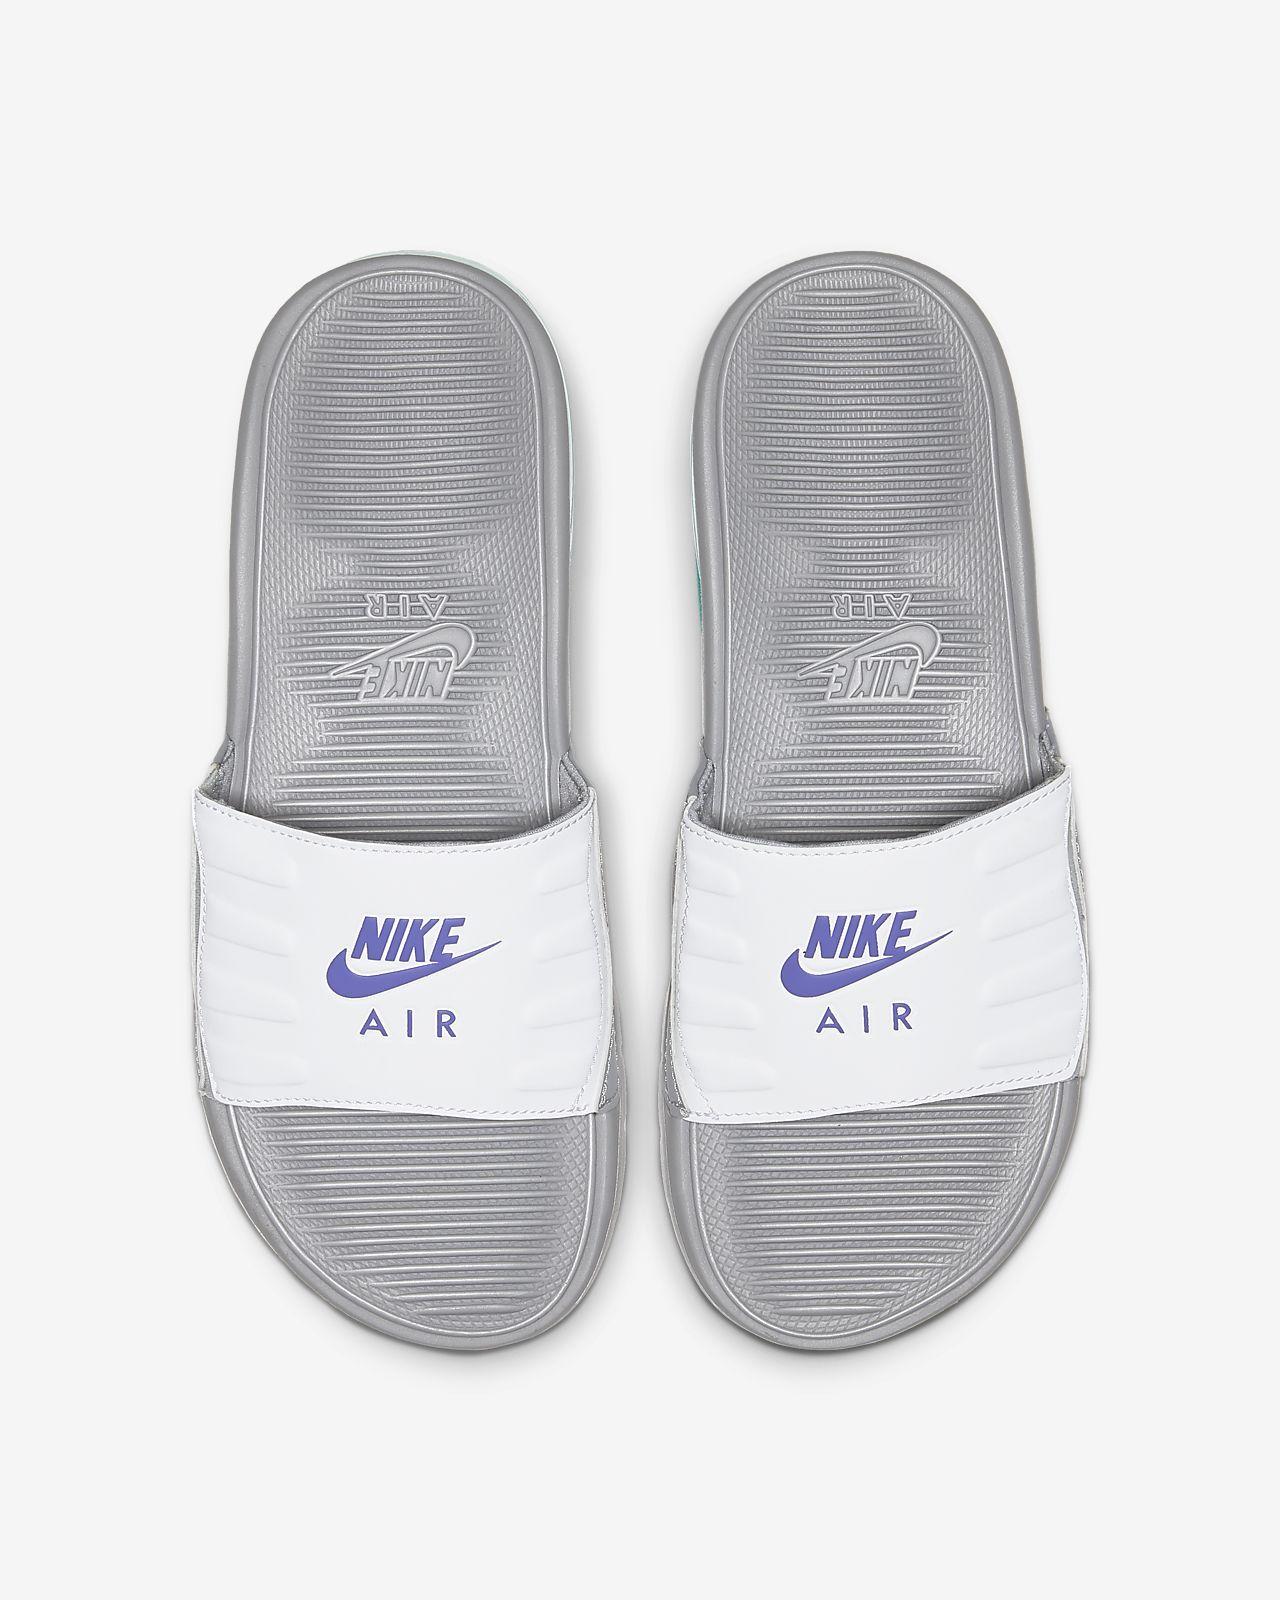 Nike Air Max Camden Women's Slide